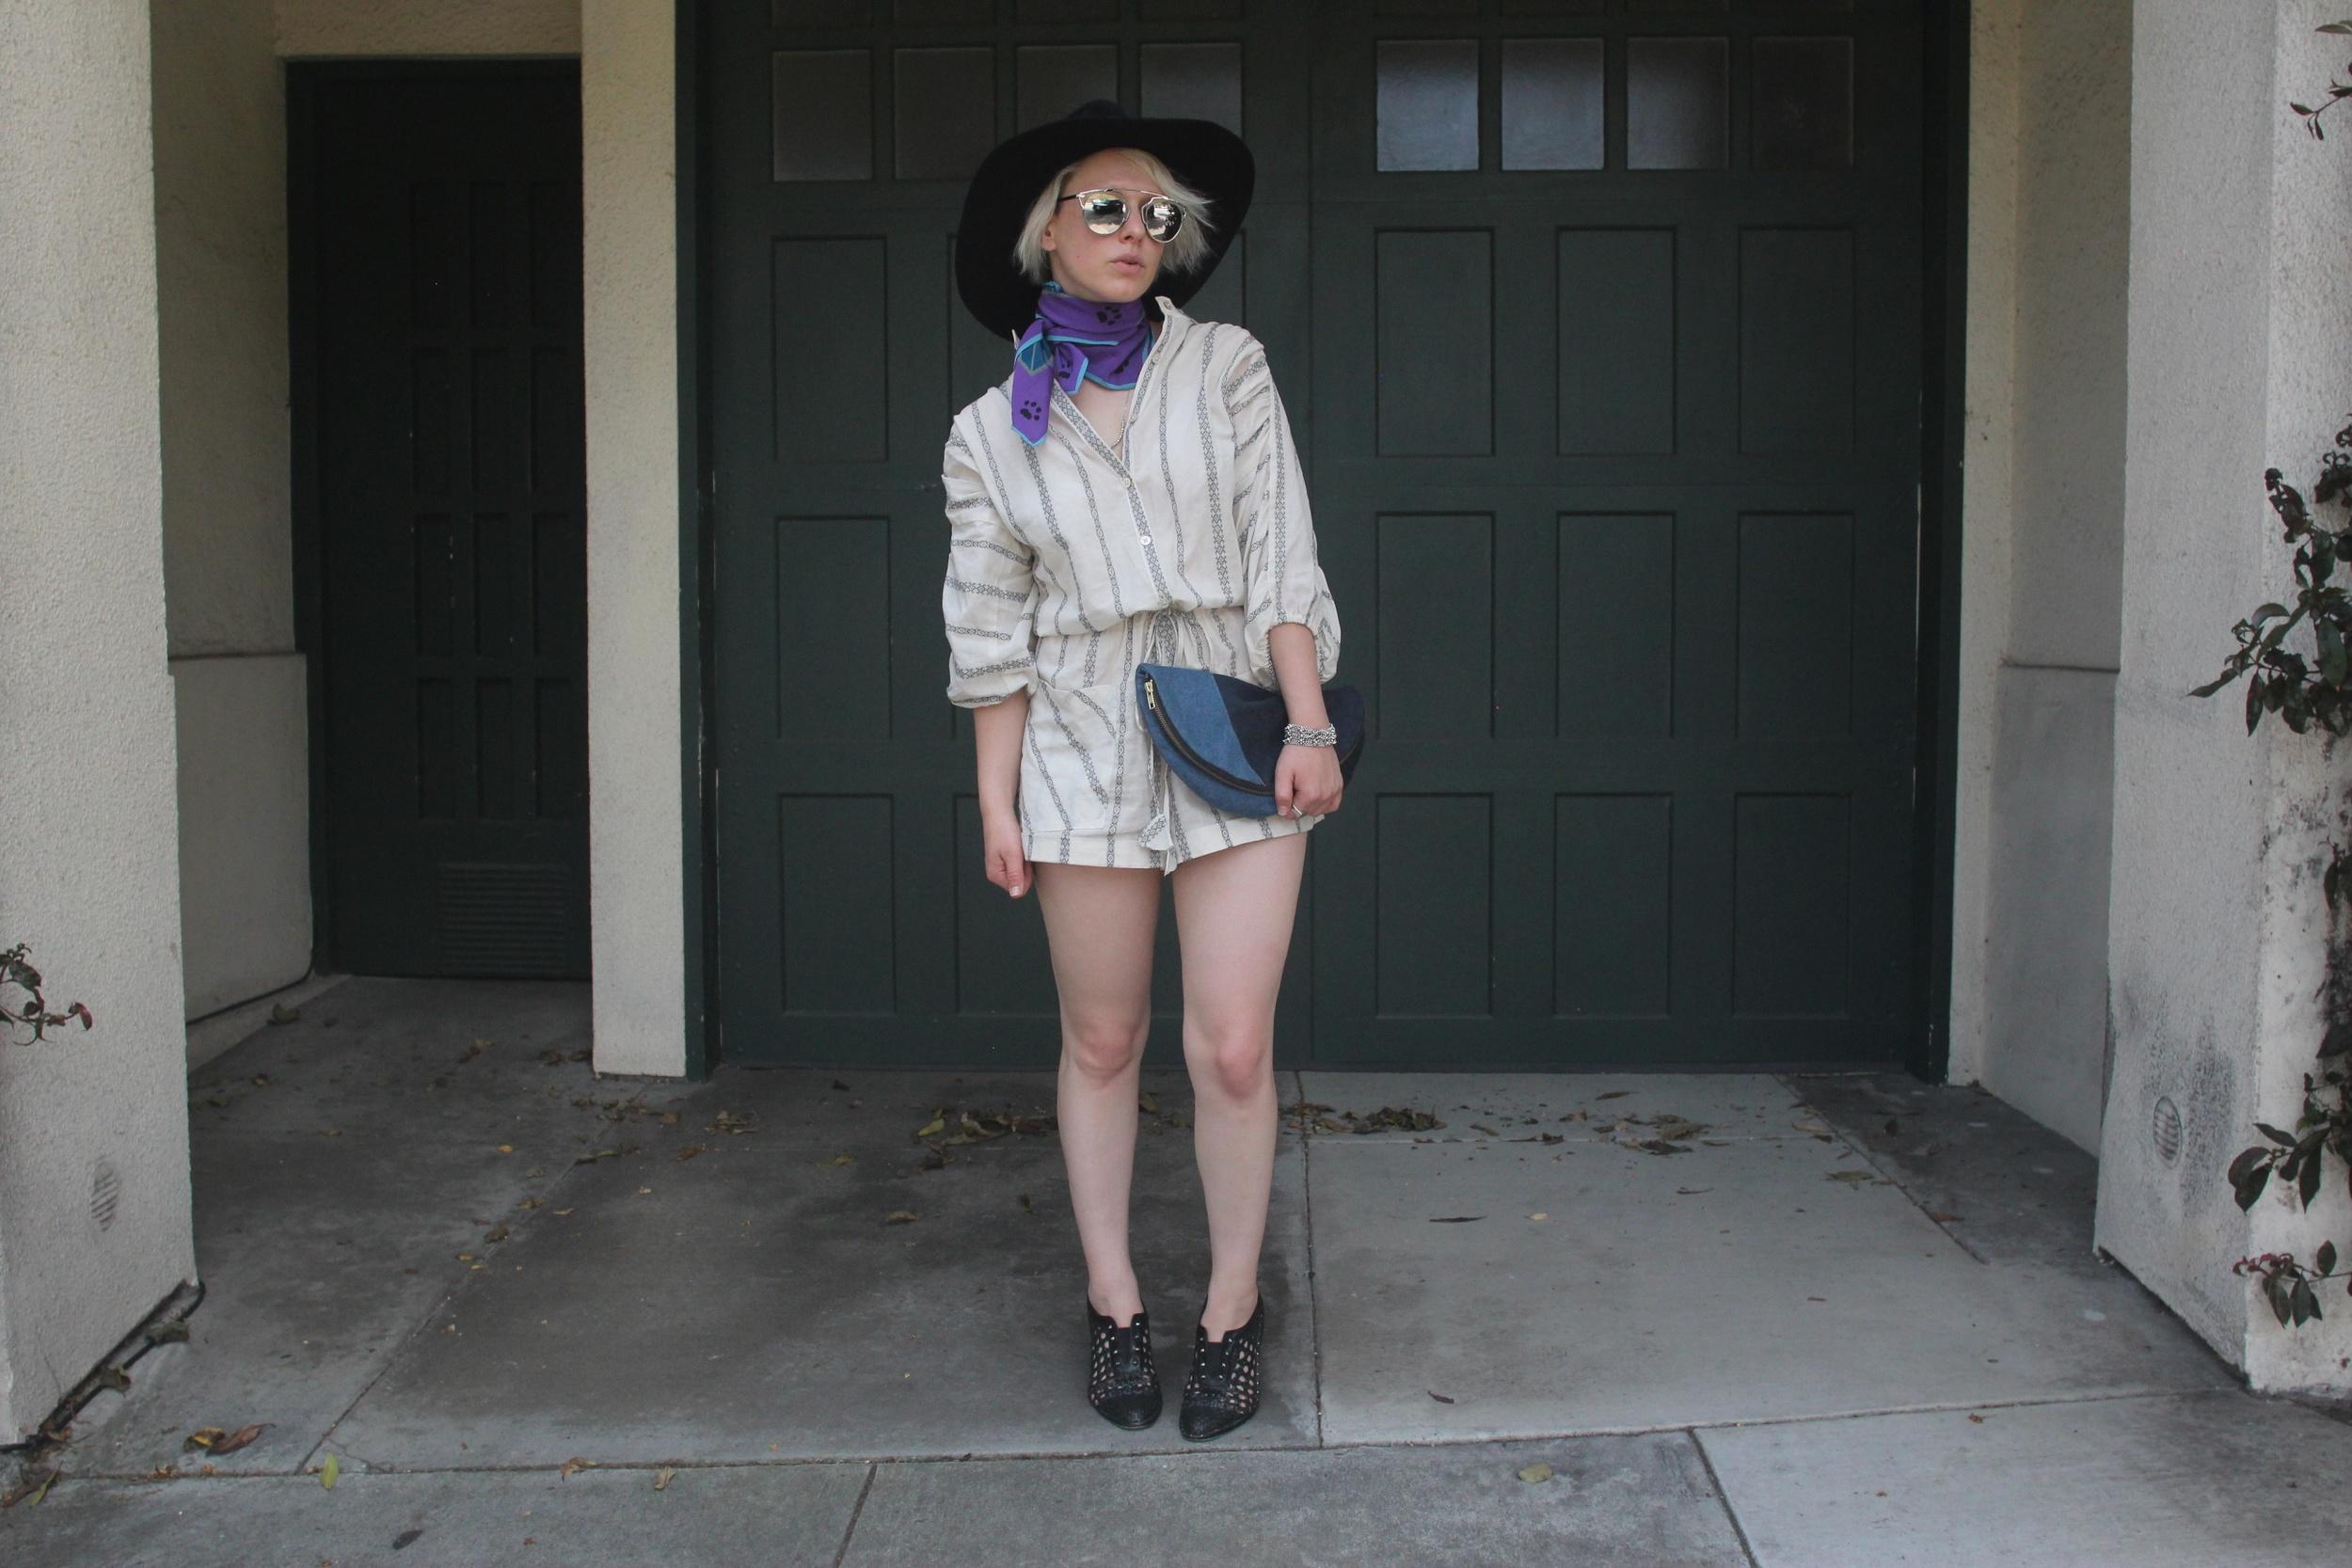 Hat: Ryan Roche, Sunglasses:  Dior , Scarf: Vintage, Romper: The Podolls, Clutch: Lofti via  LegionSF , Shoes:  Freda Salvador